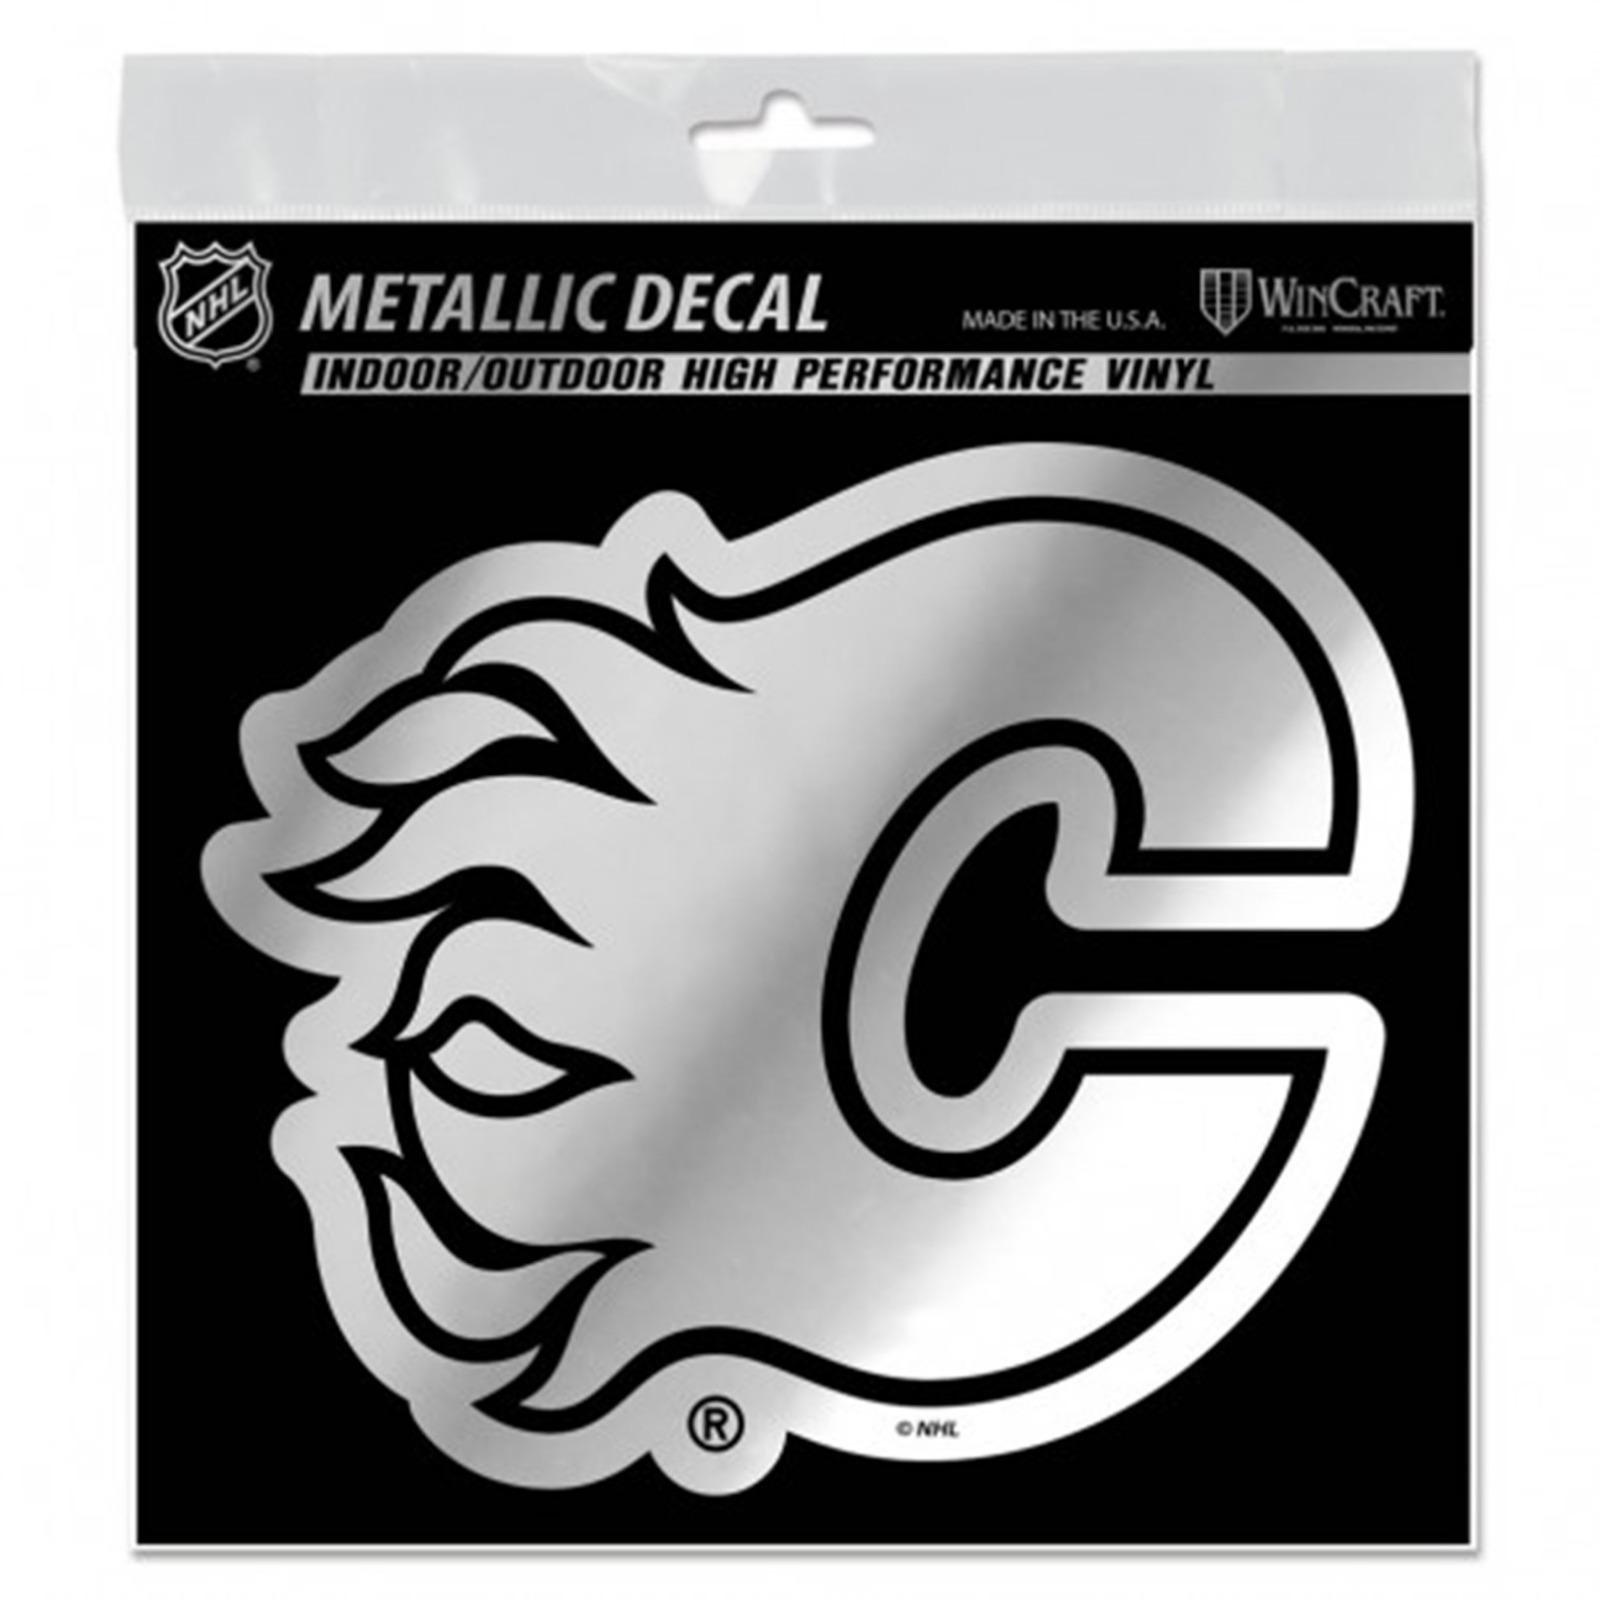 Calgary Flames 6 Silver Metallic Style Decal Die Cut Sticker Vinyl Auto Hockey 99606239709 Ebay